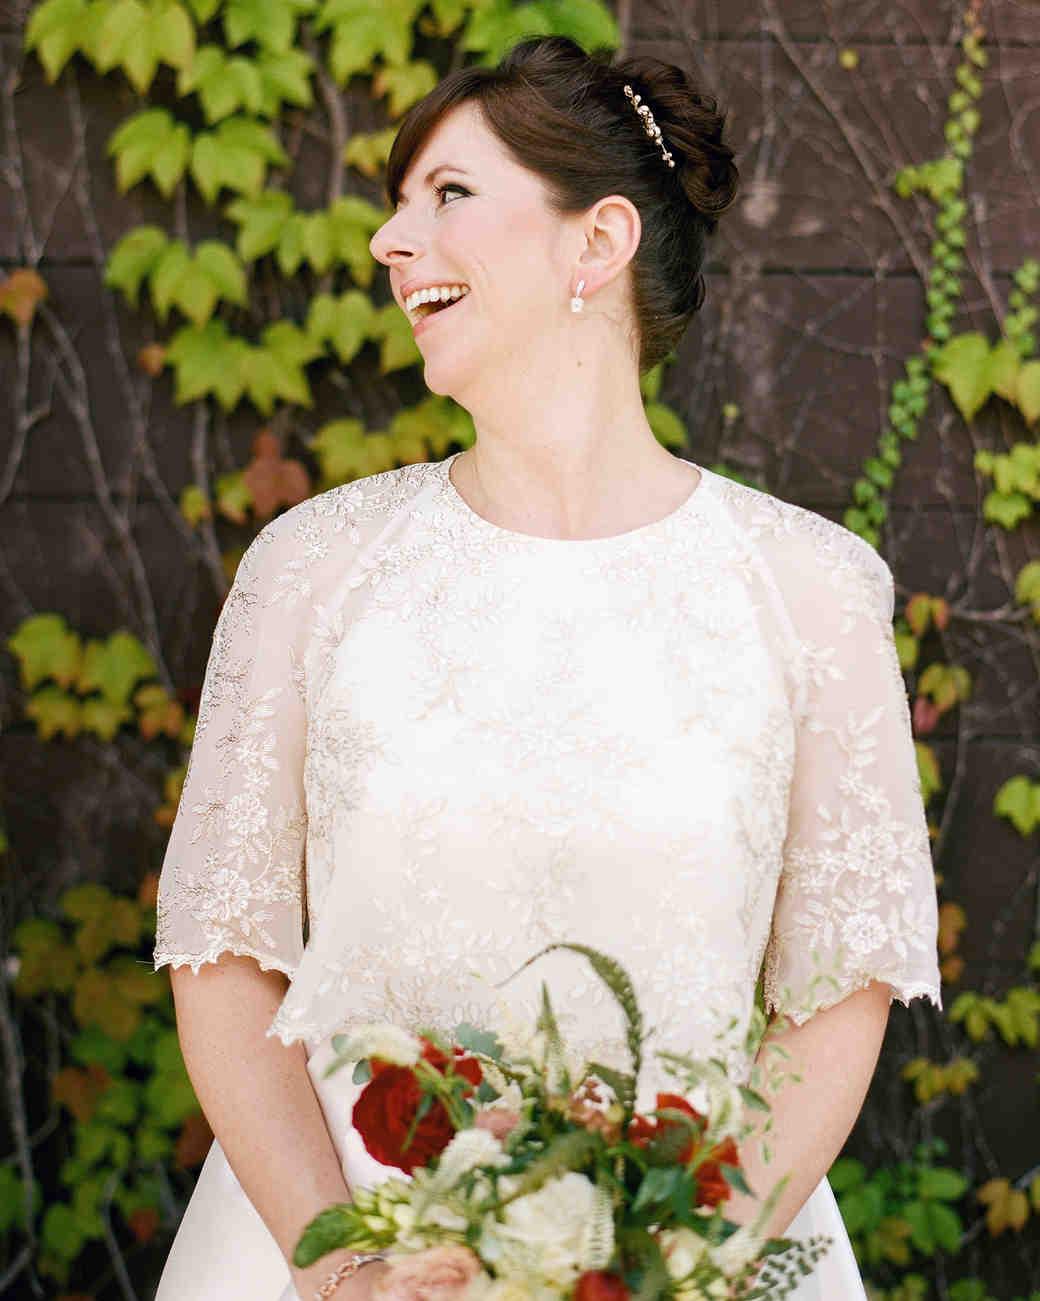 editor-wedding-beauty-looks-jaime-buerger-0915.jpg